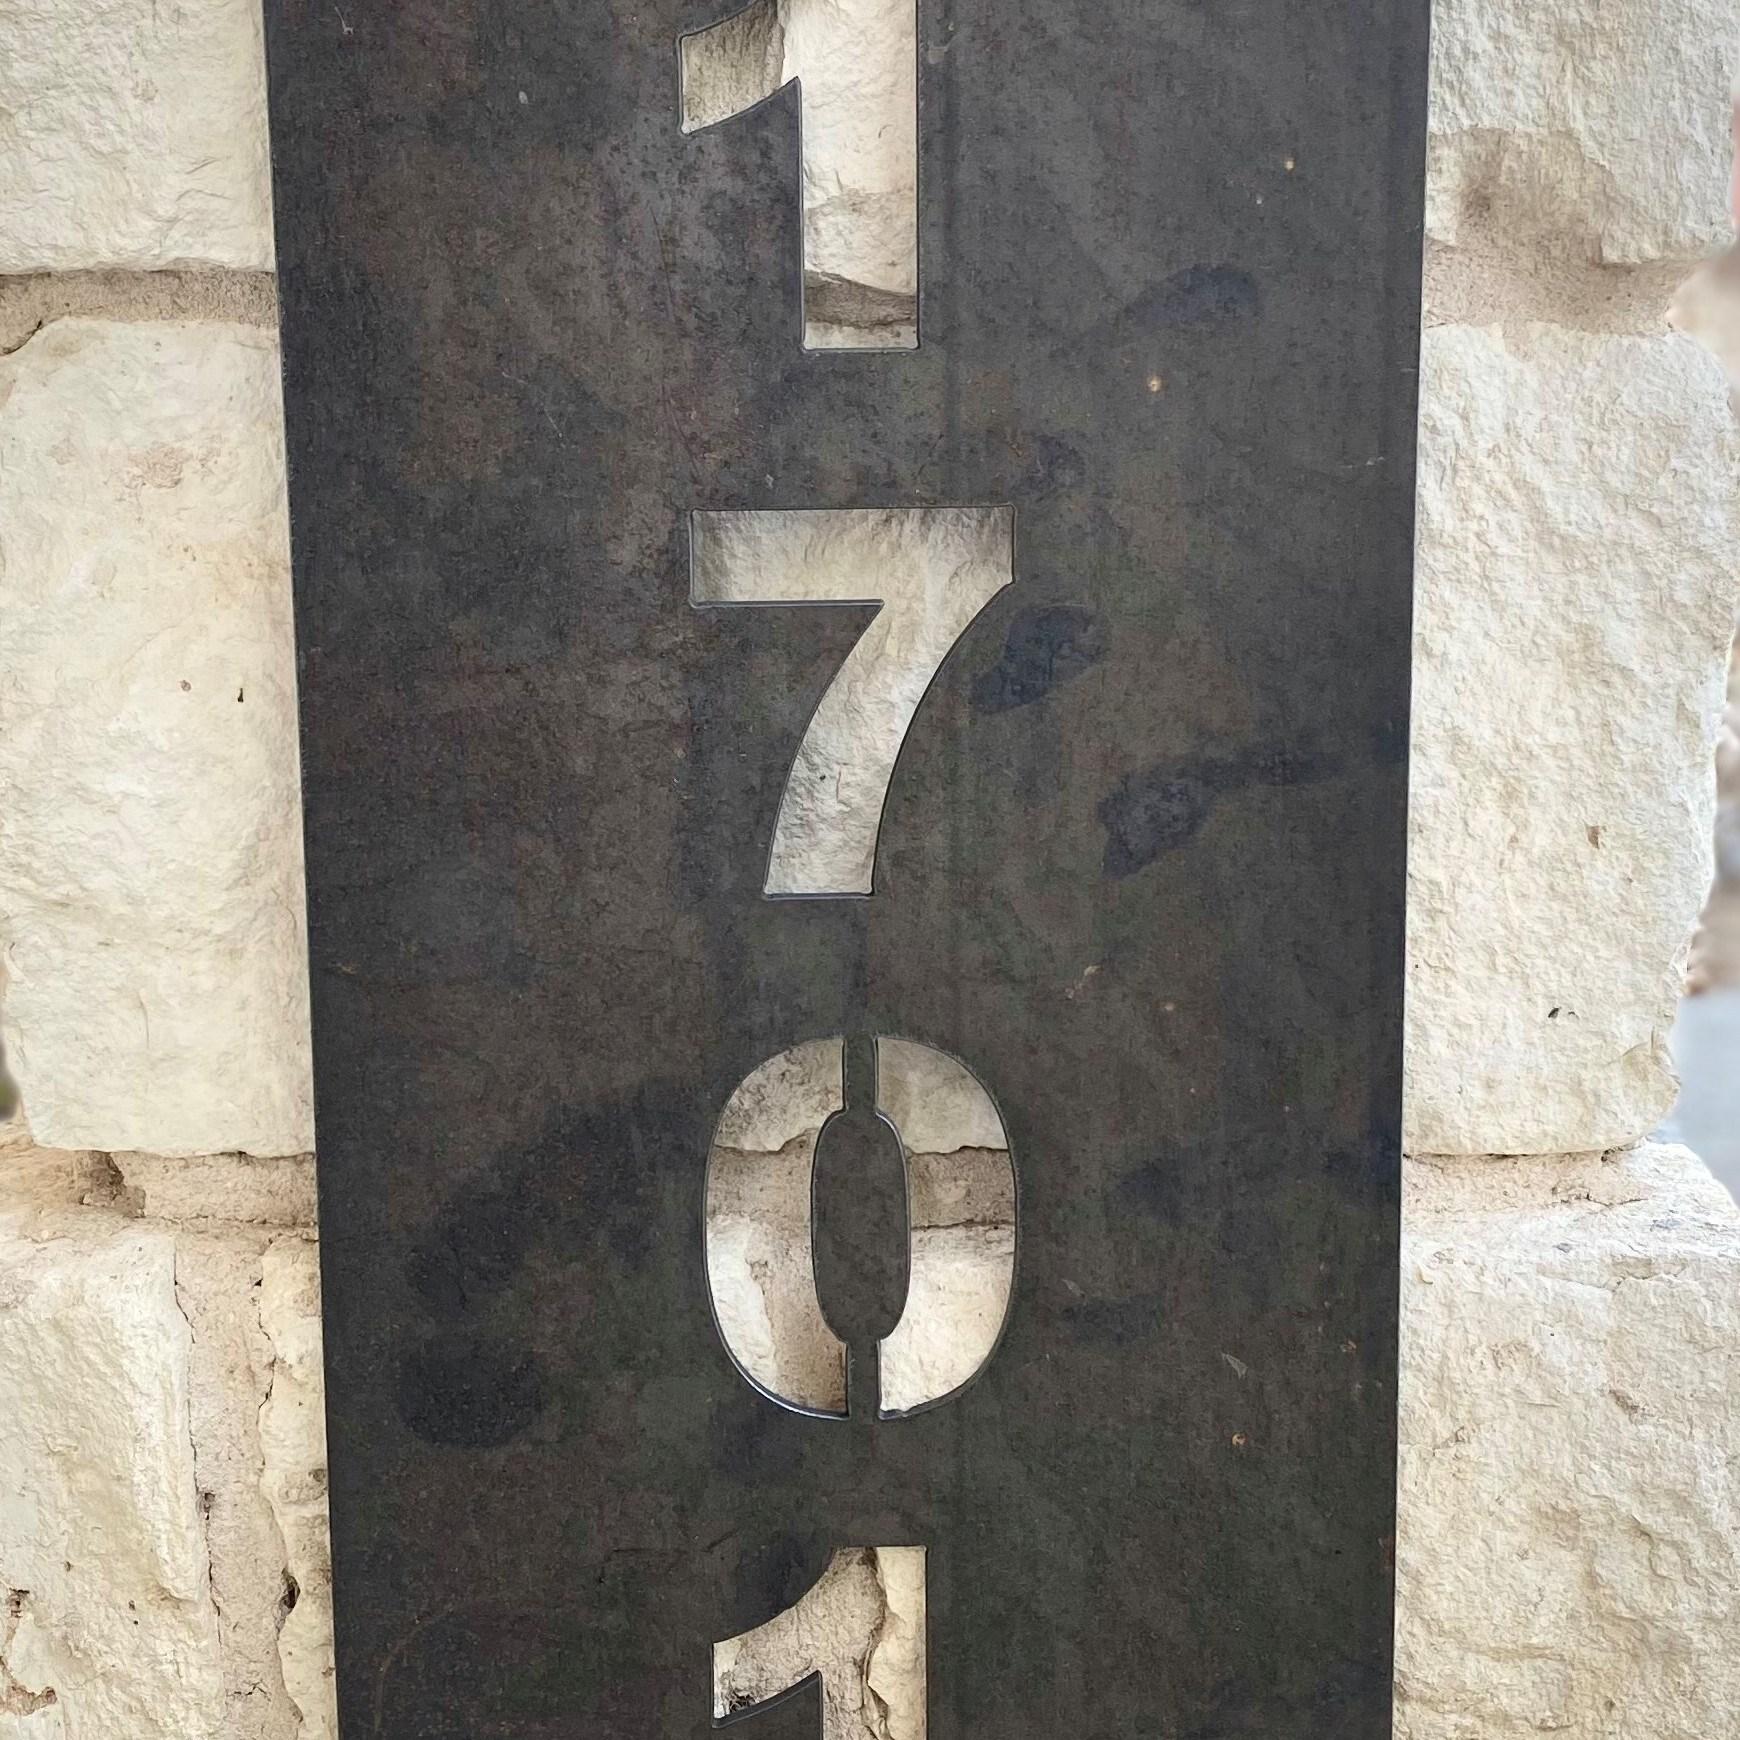 Custom metal address plates, Welding Shop Austin, Texas kyle@weldingaustin.com